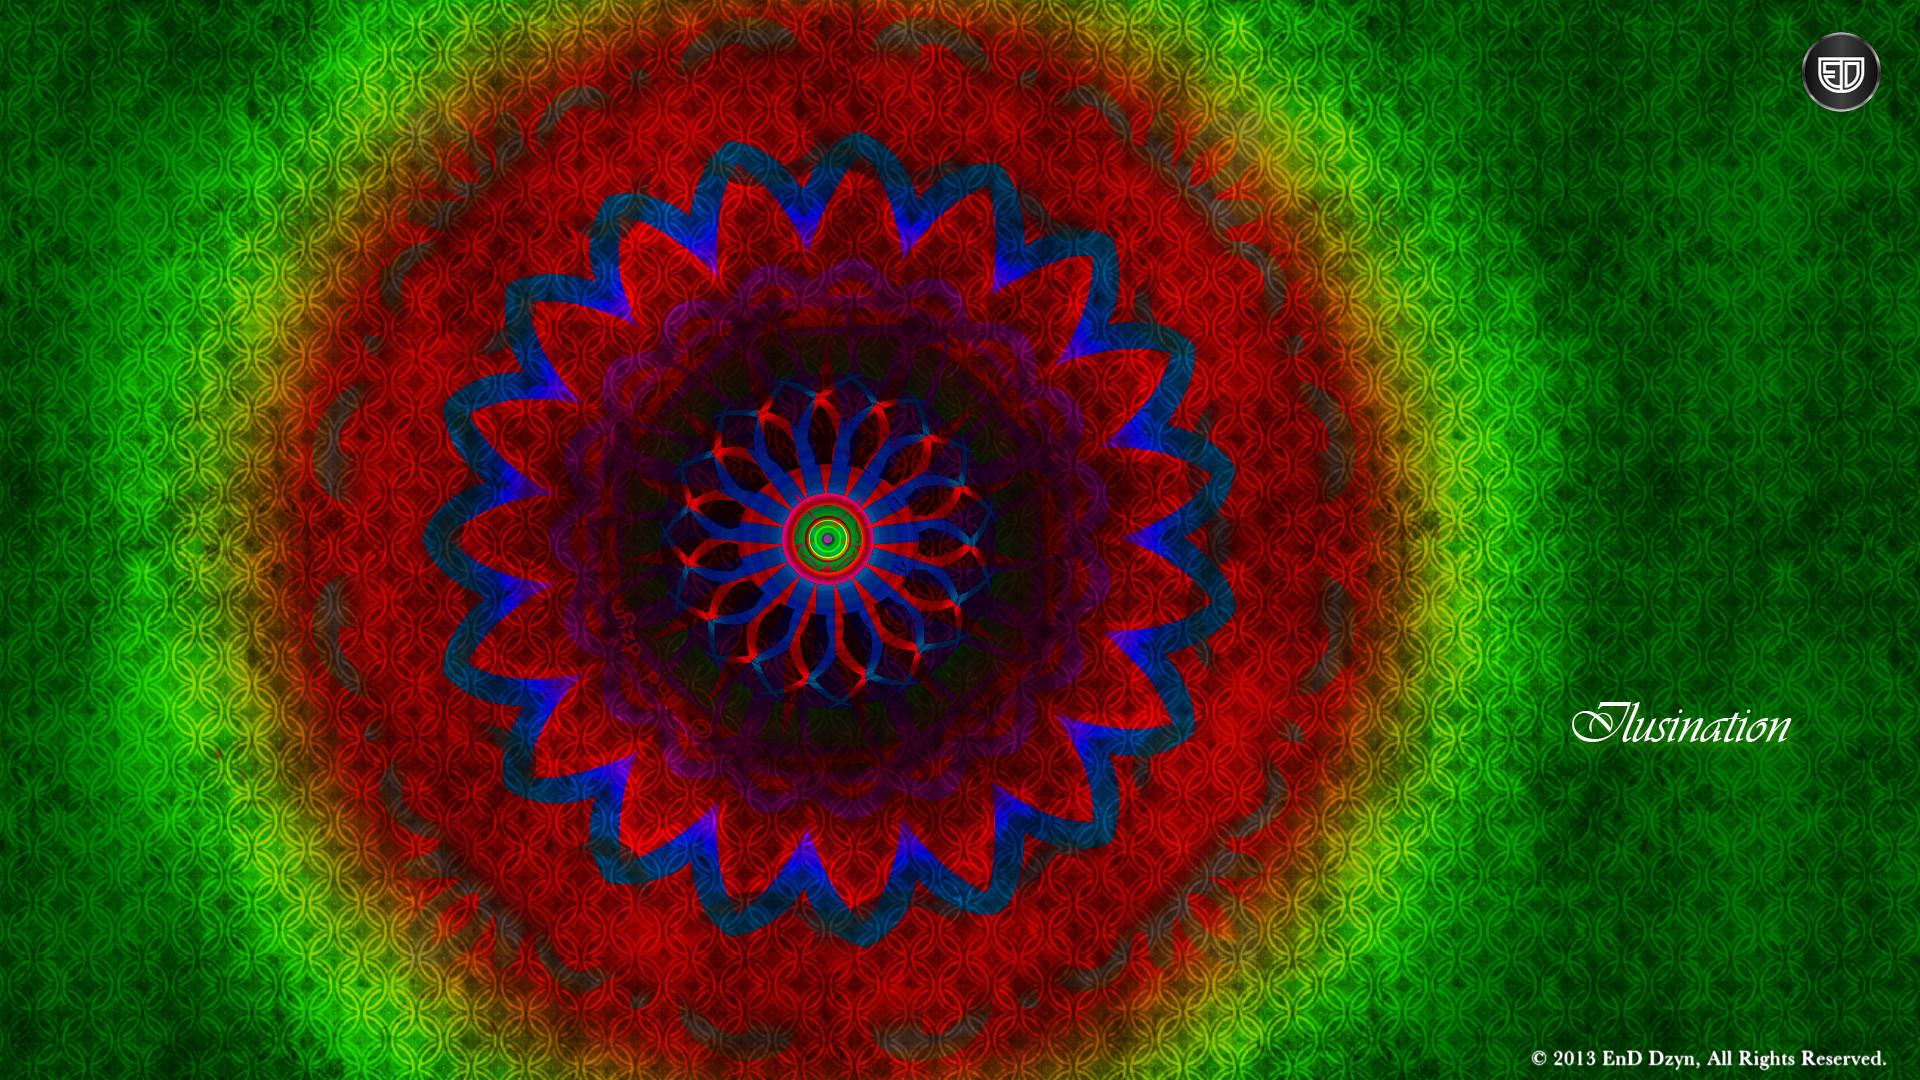 album-art-design-abstract-psychedelic-graffiti-wallpaper-end-